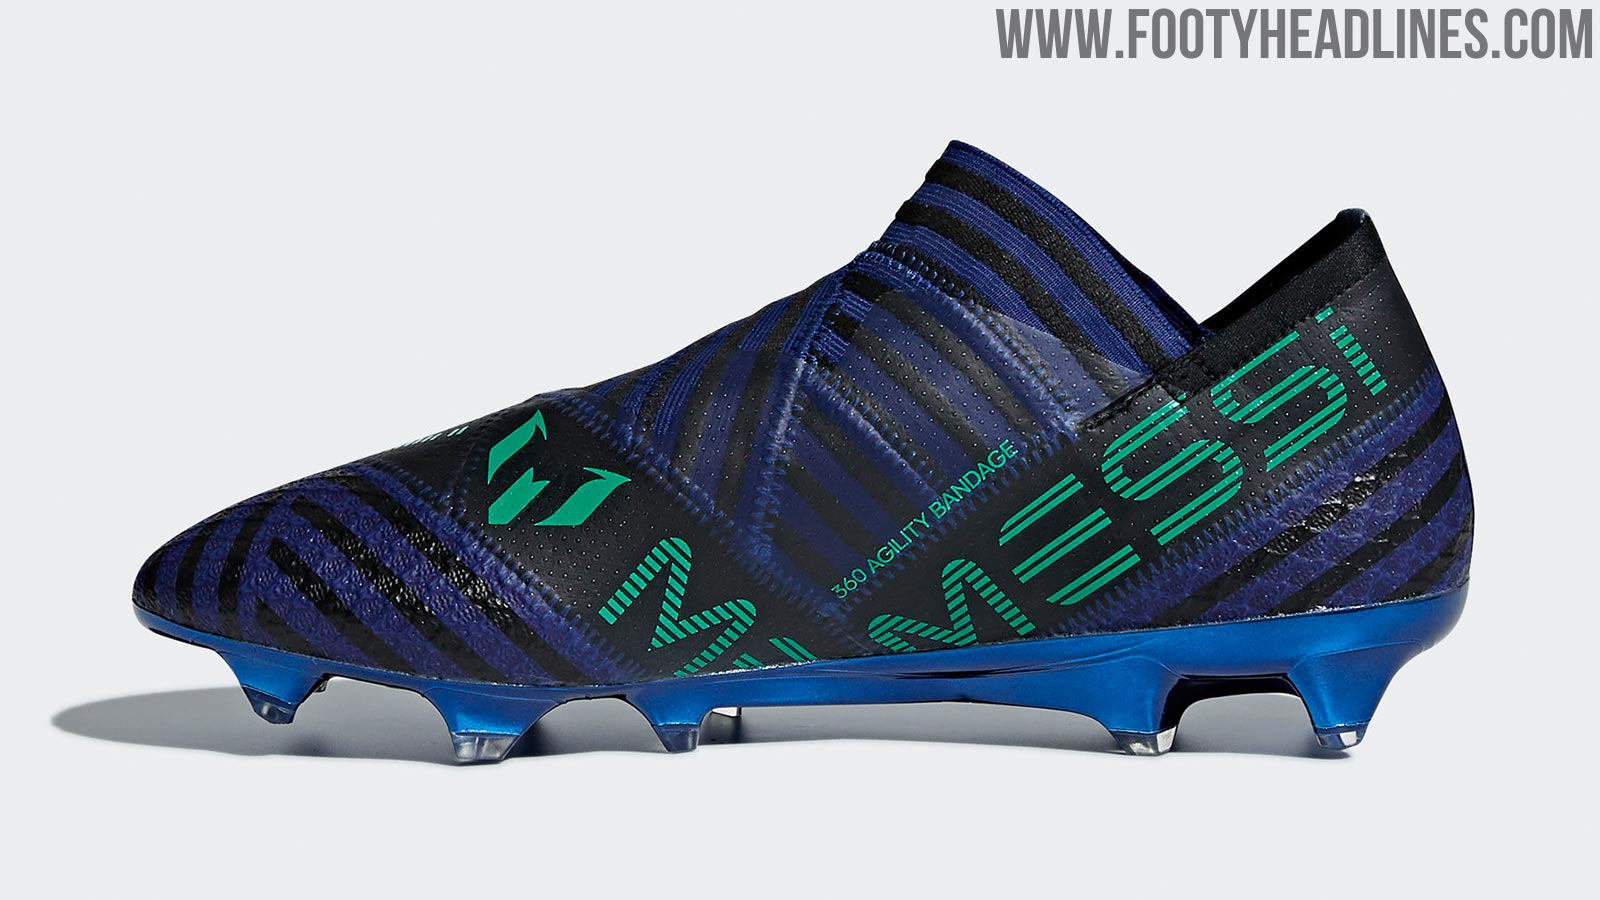 8b19bafc494 OFFICIAL   Deadly Strike  Adidas Nemeziz Messi 17 Boots Leaked ...